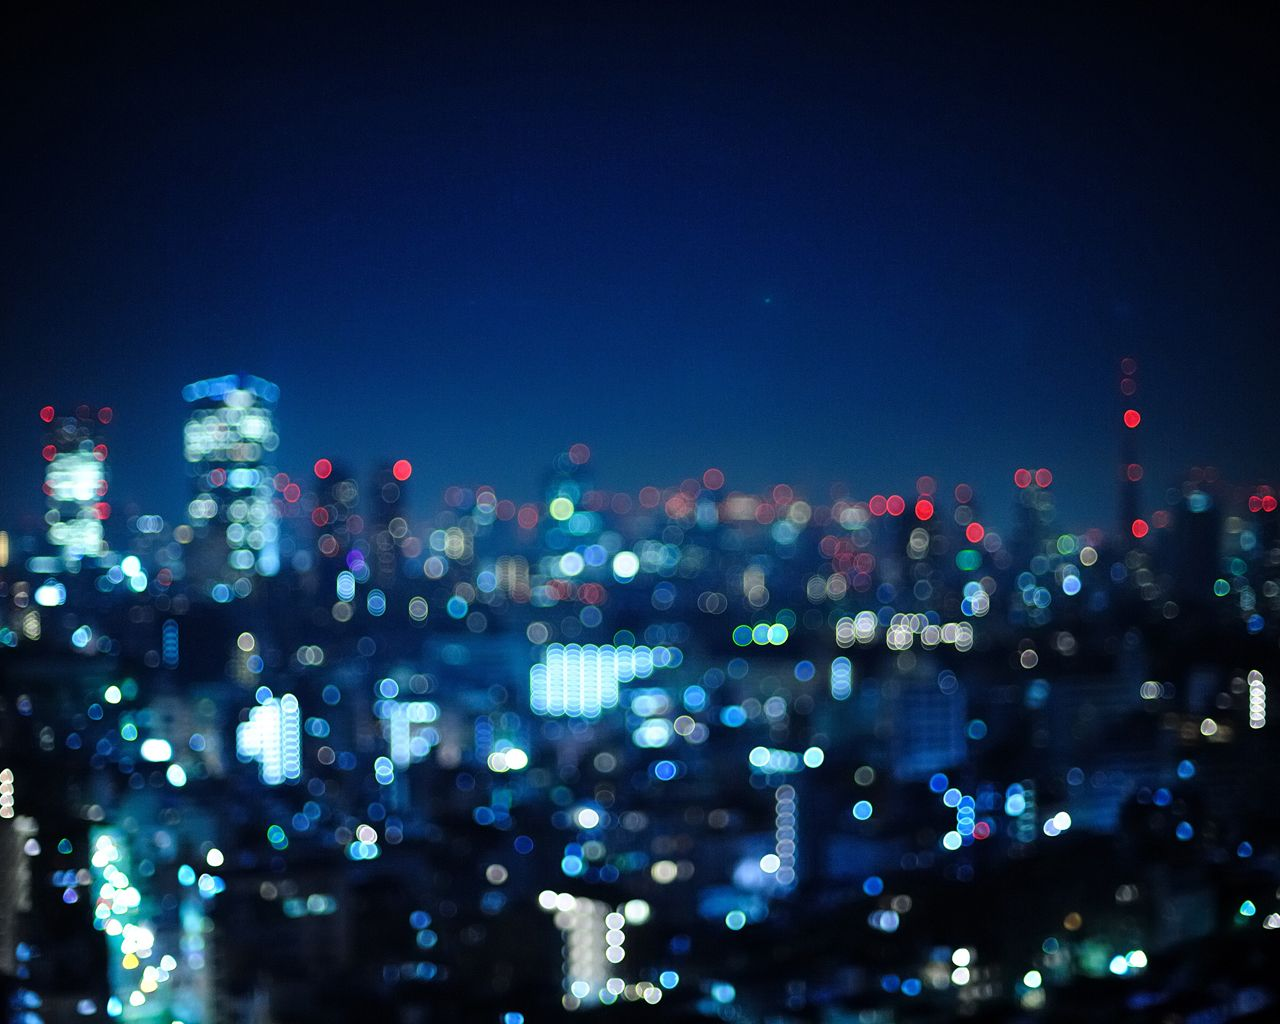 Blur And Blue Bokeh City Bokeh Wallpaper Background Wallpapers